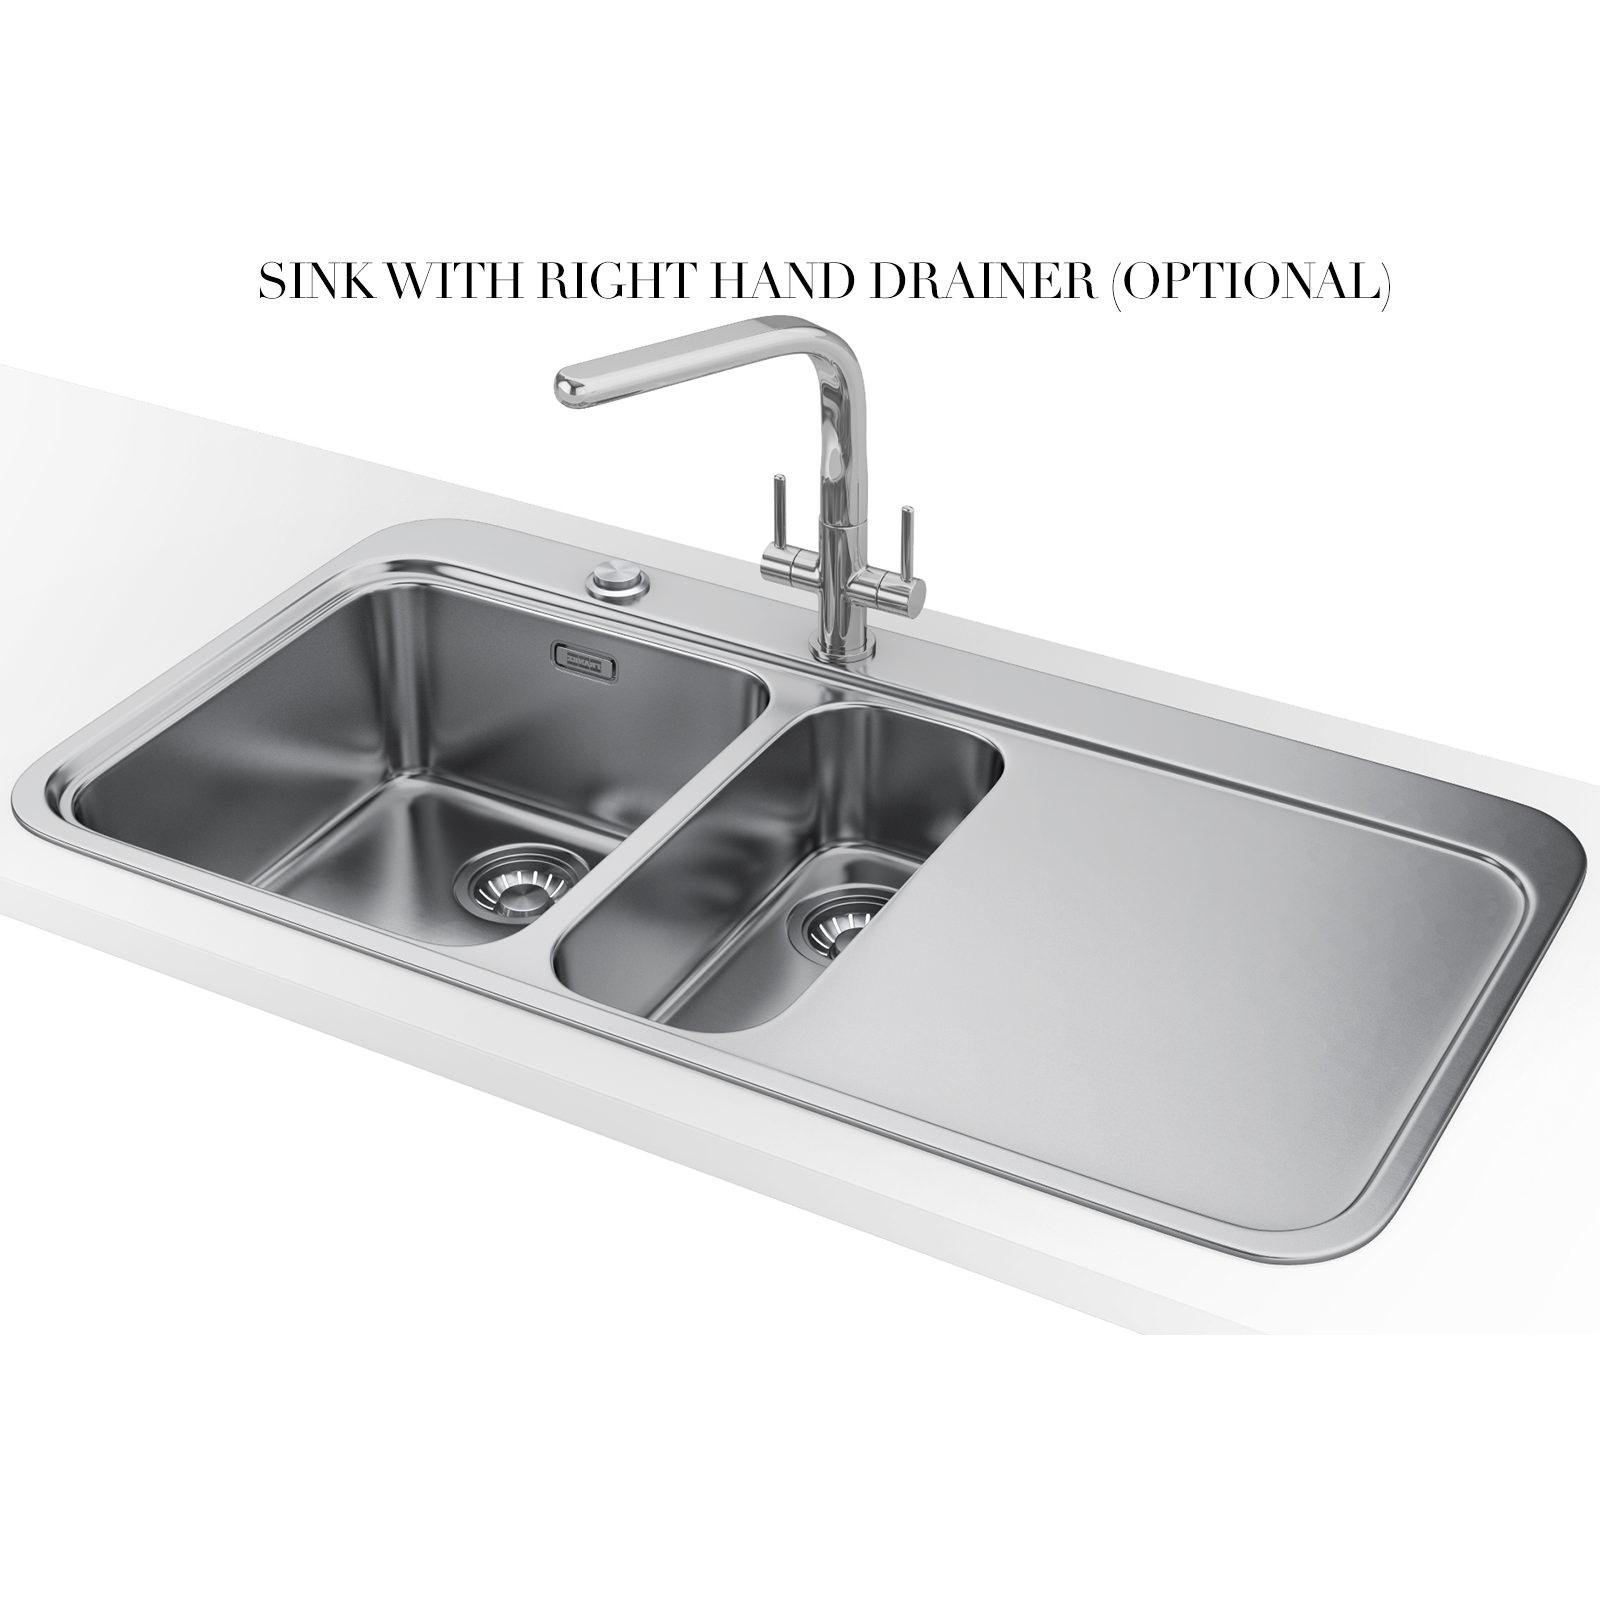 Großzügig Billige Küchenarmaturen Uk Ideen - Küchenschrank Ideen ...